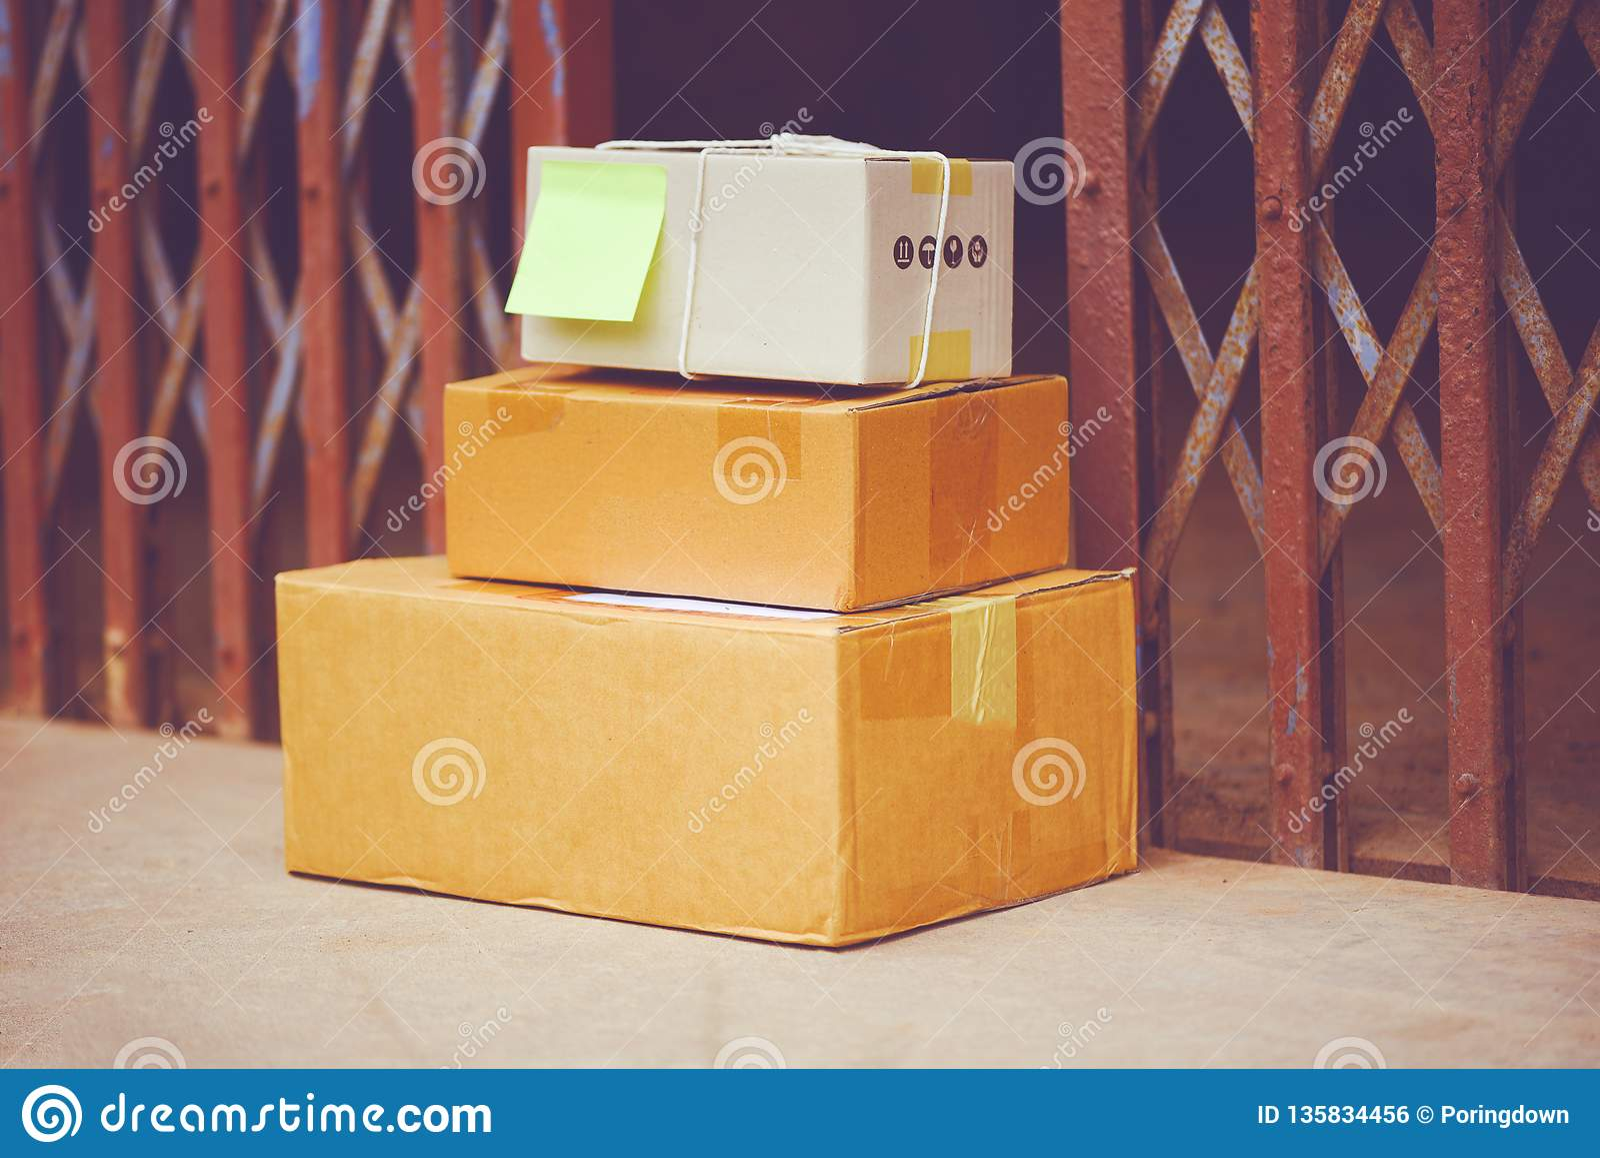 Ecommerce delivery shopping online and order concept - delivered parcels on floor near front door steel